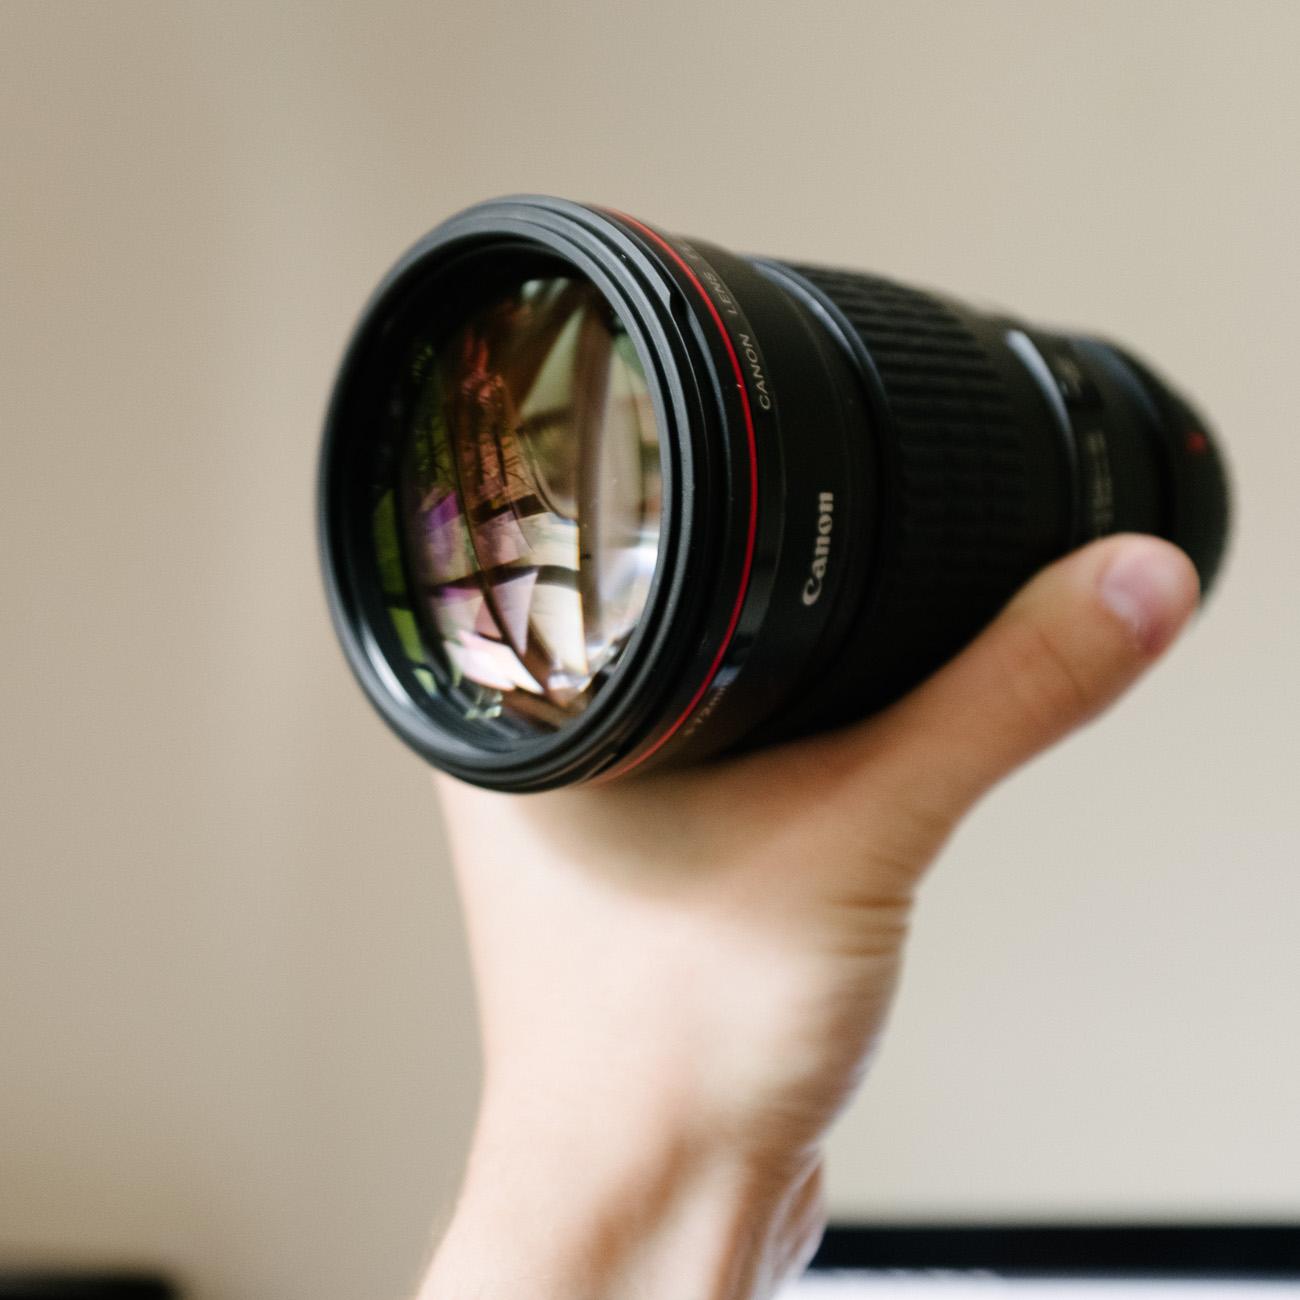 canon-200-2.8-lens-review-full-frame-l-series-product.jpg